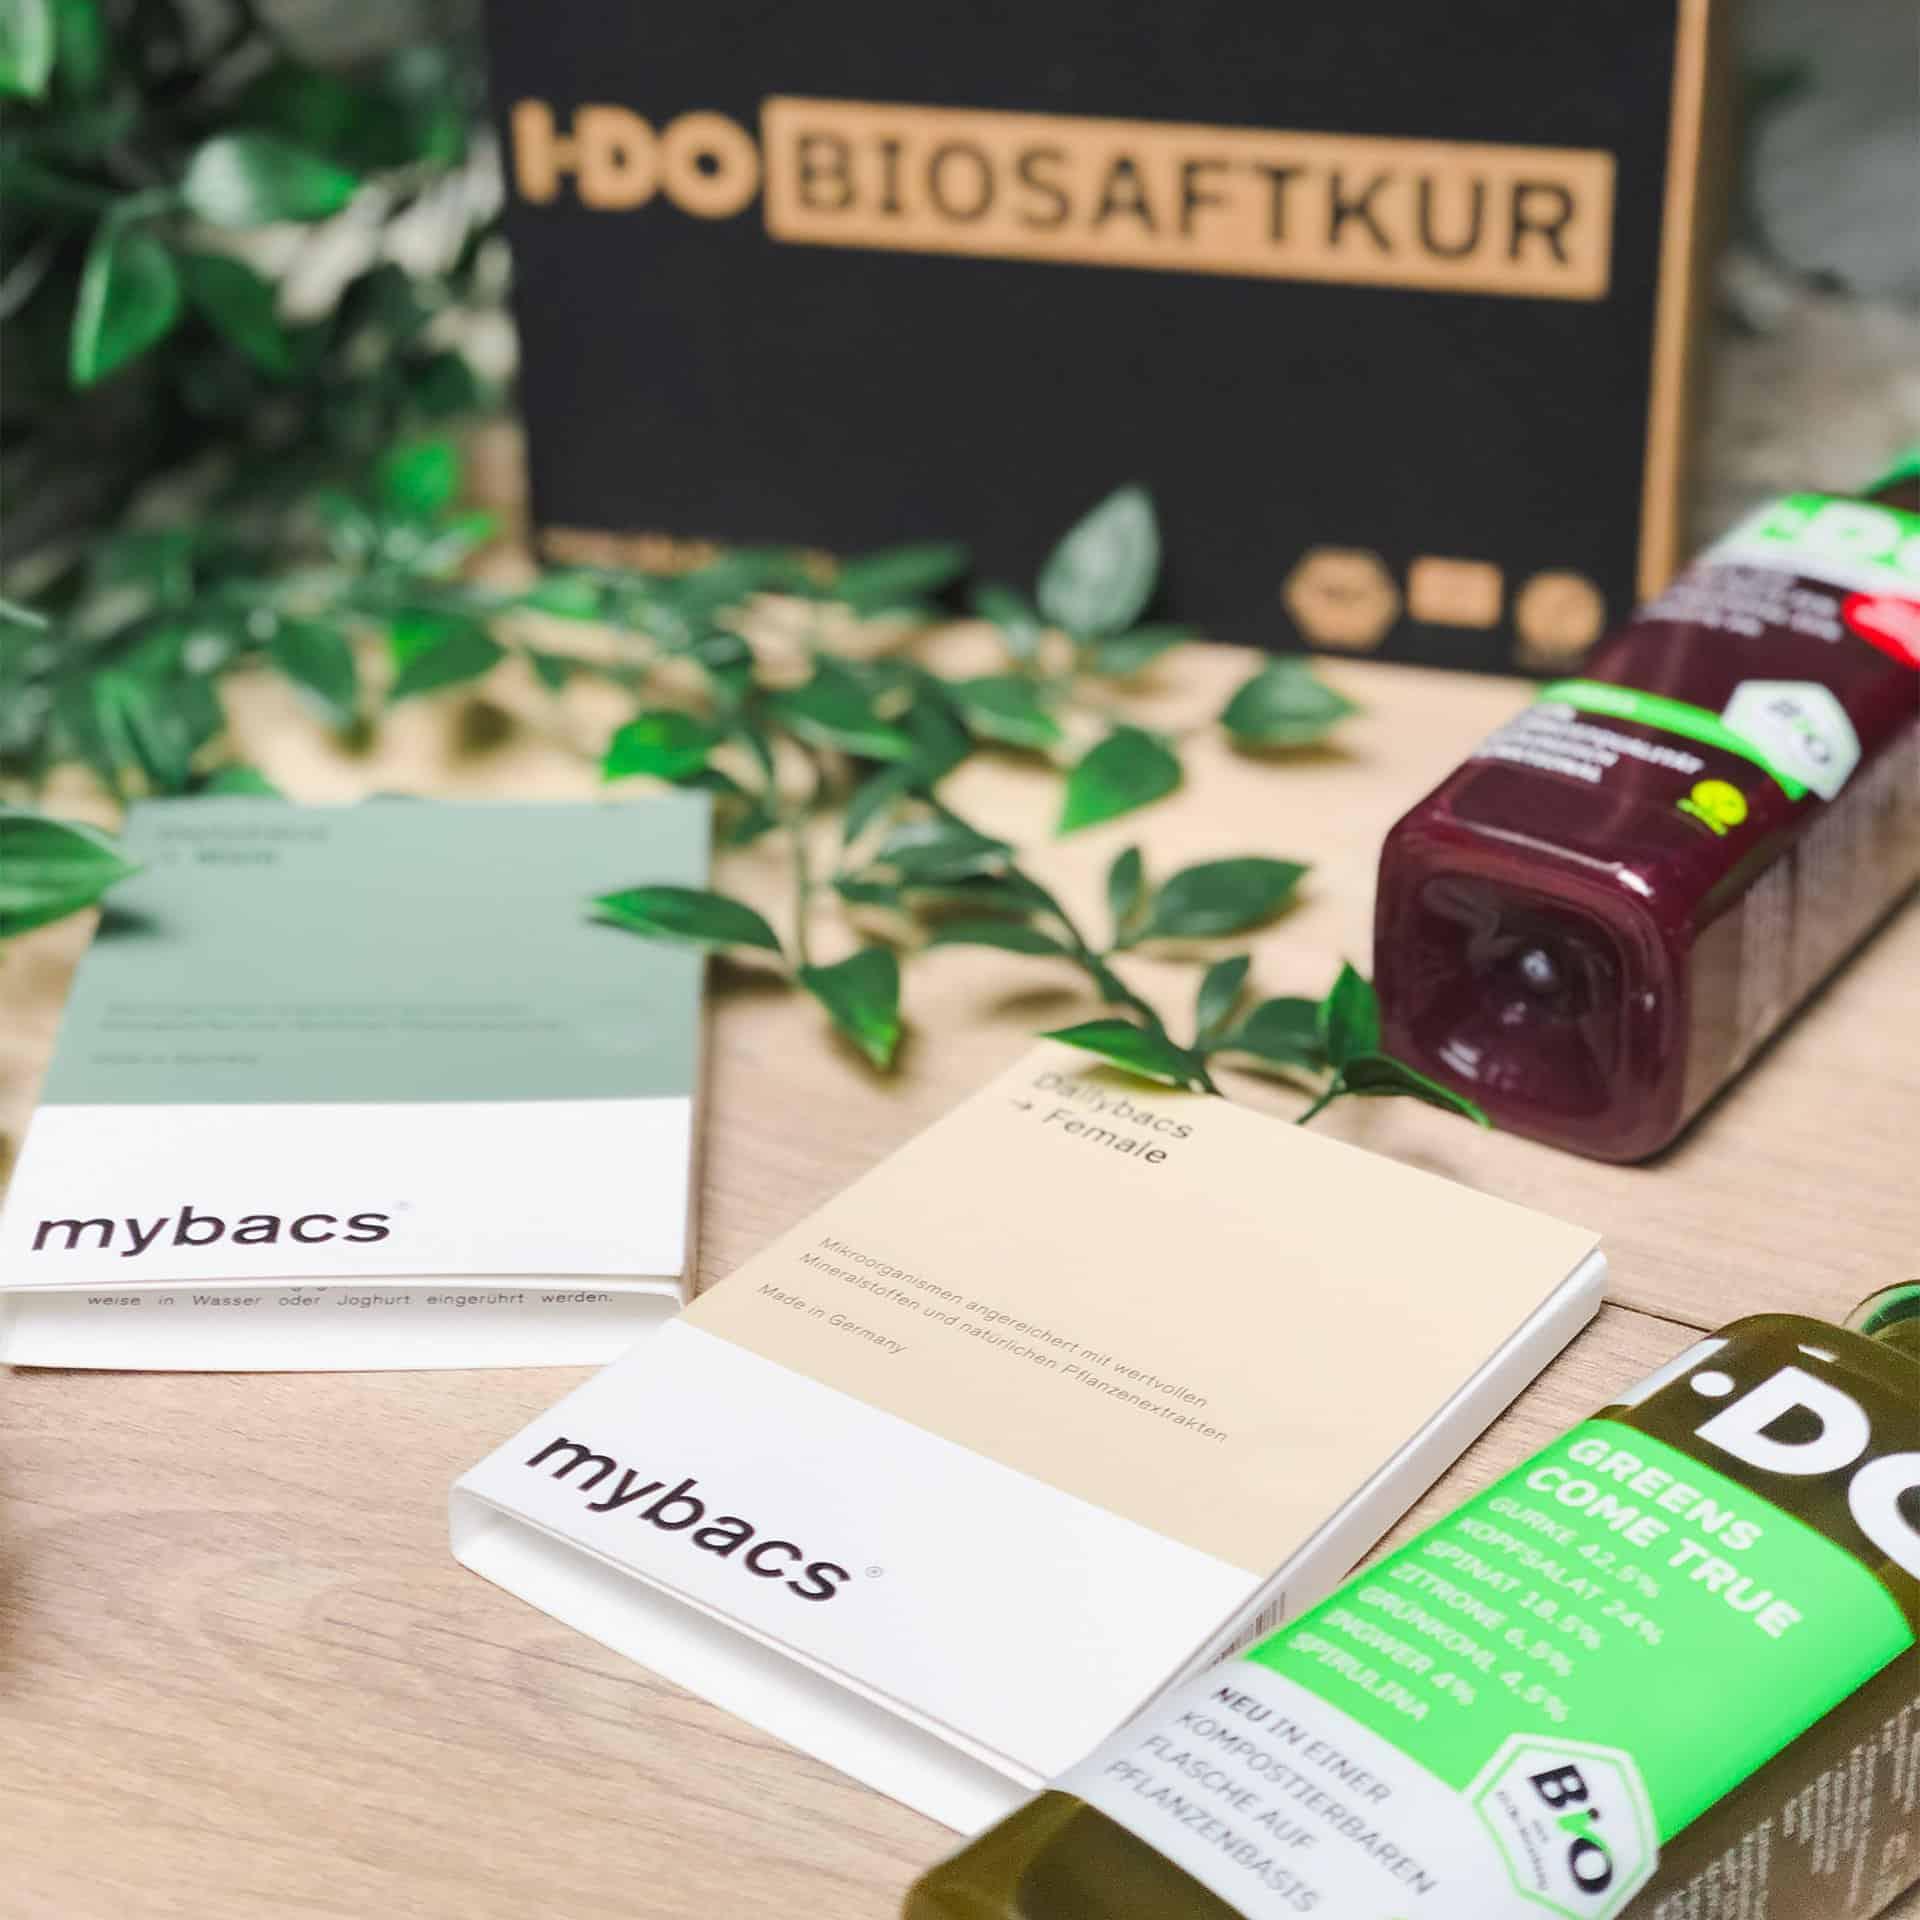 I·DO Bio Saftkur mit mybacs